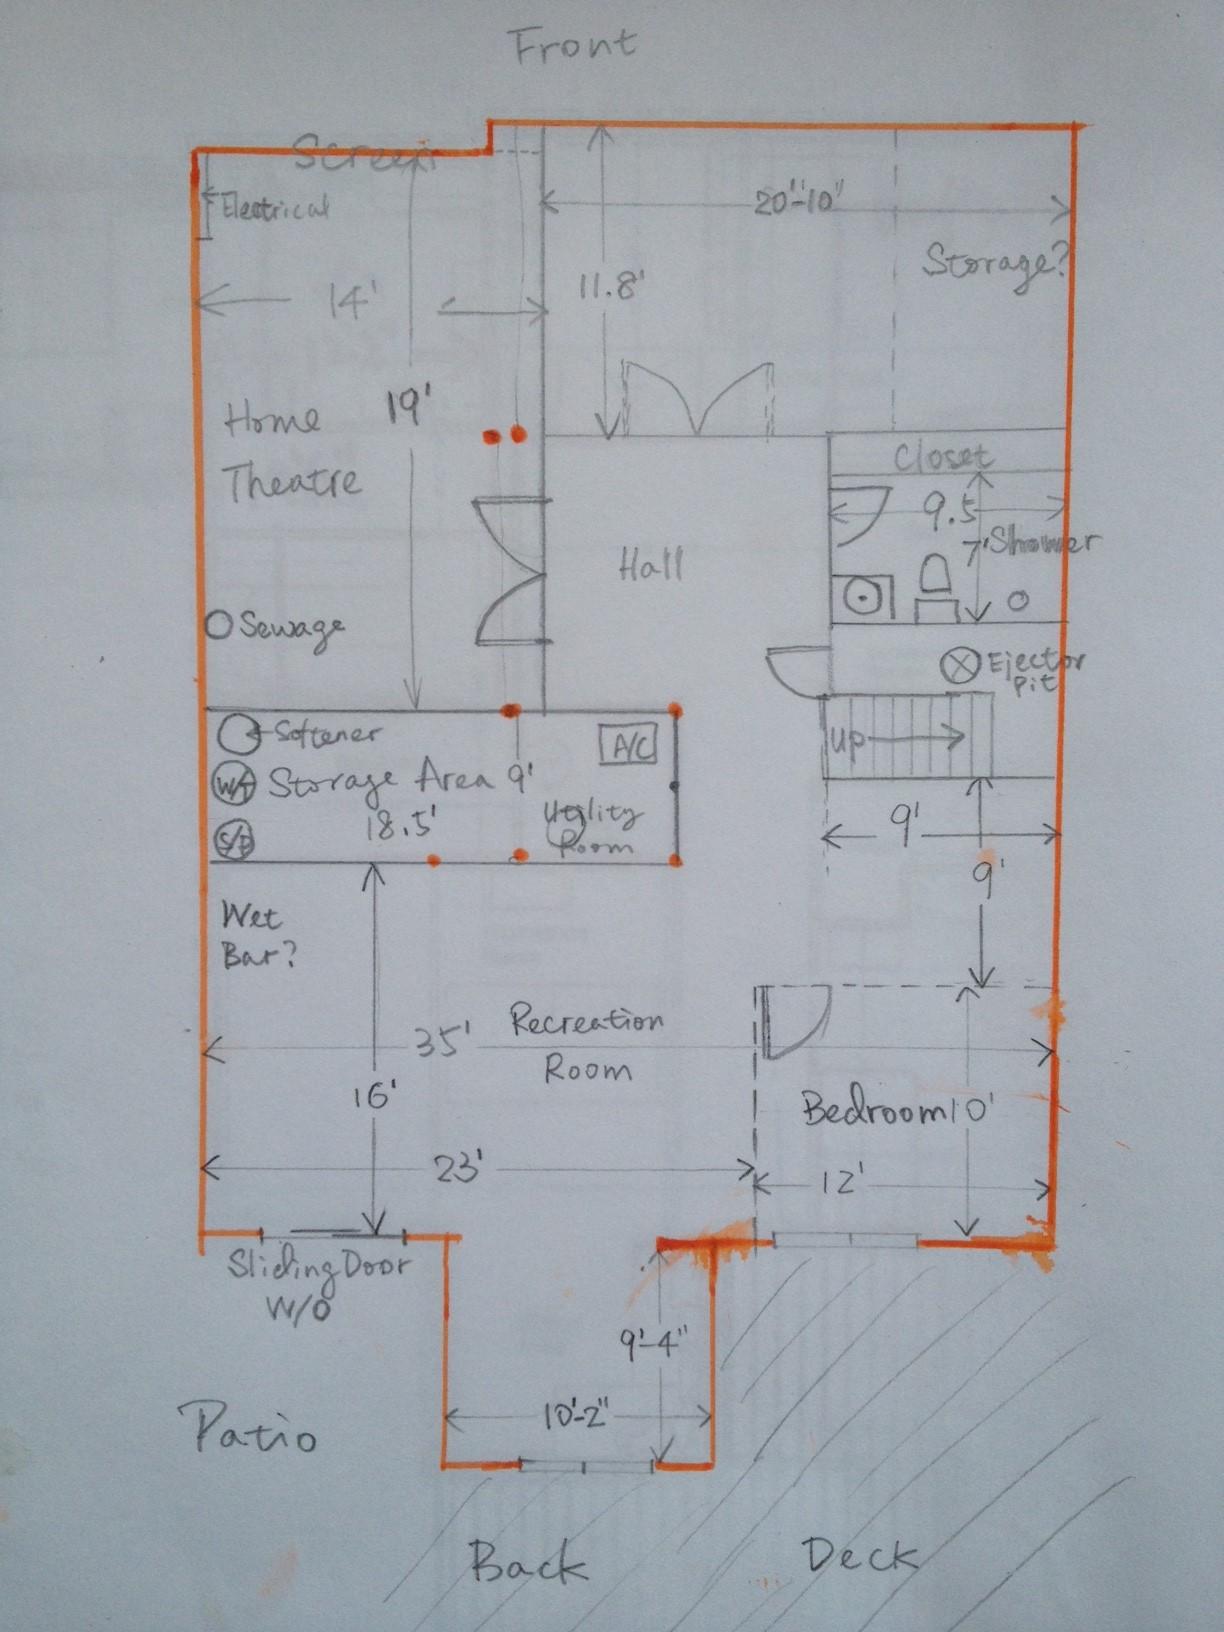 Design My Basement help with my basement floorplan please! (floor, ceiling, shower